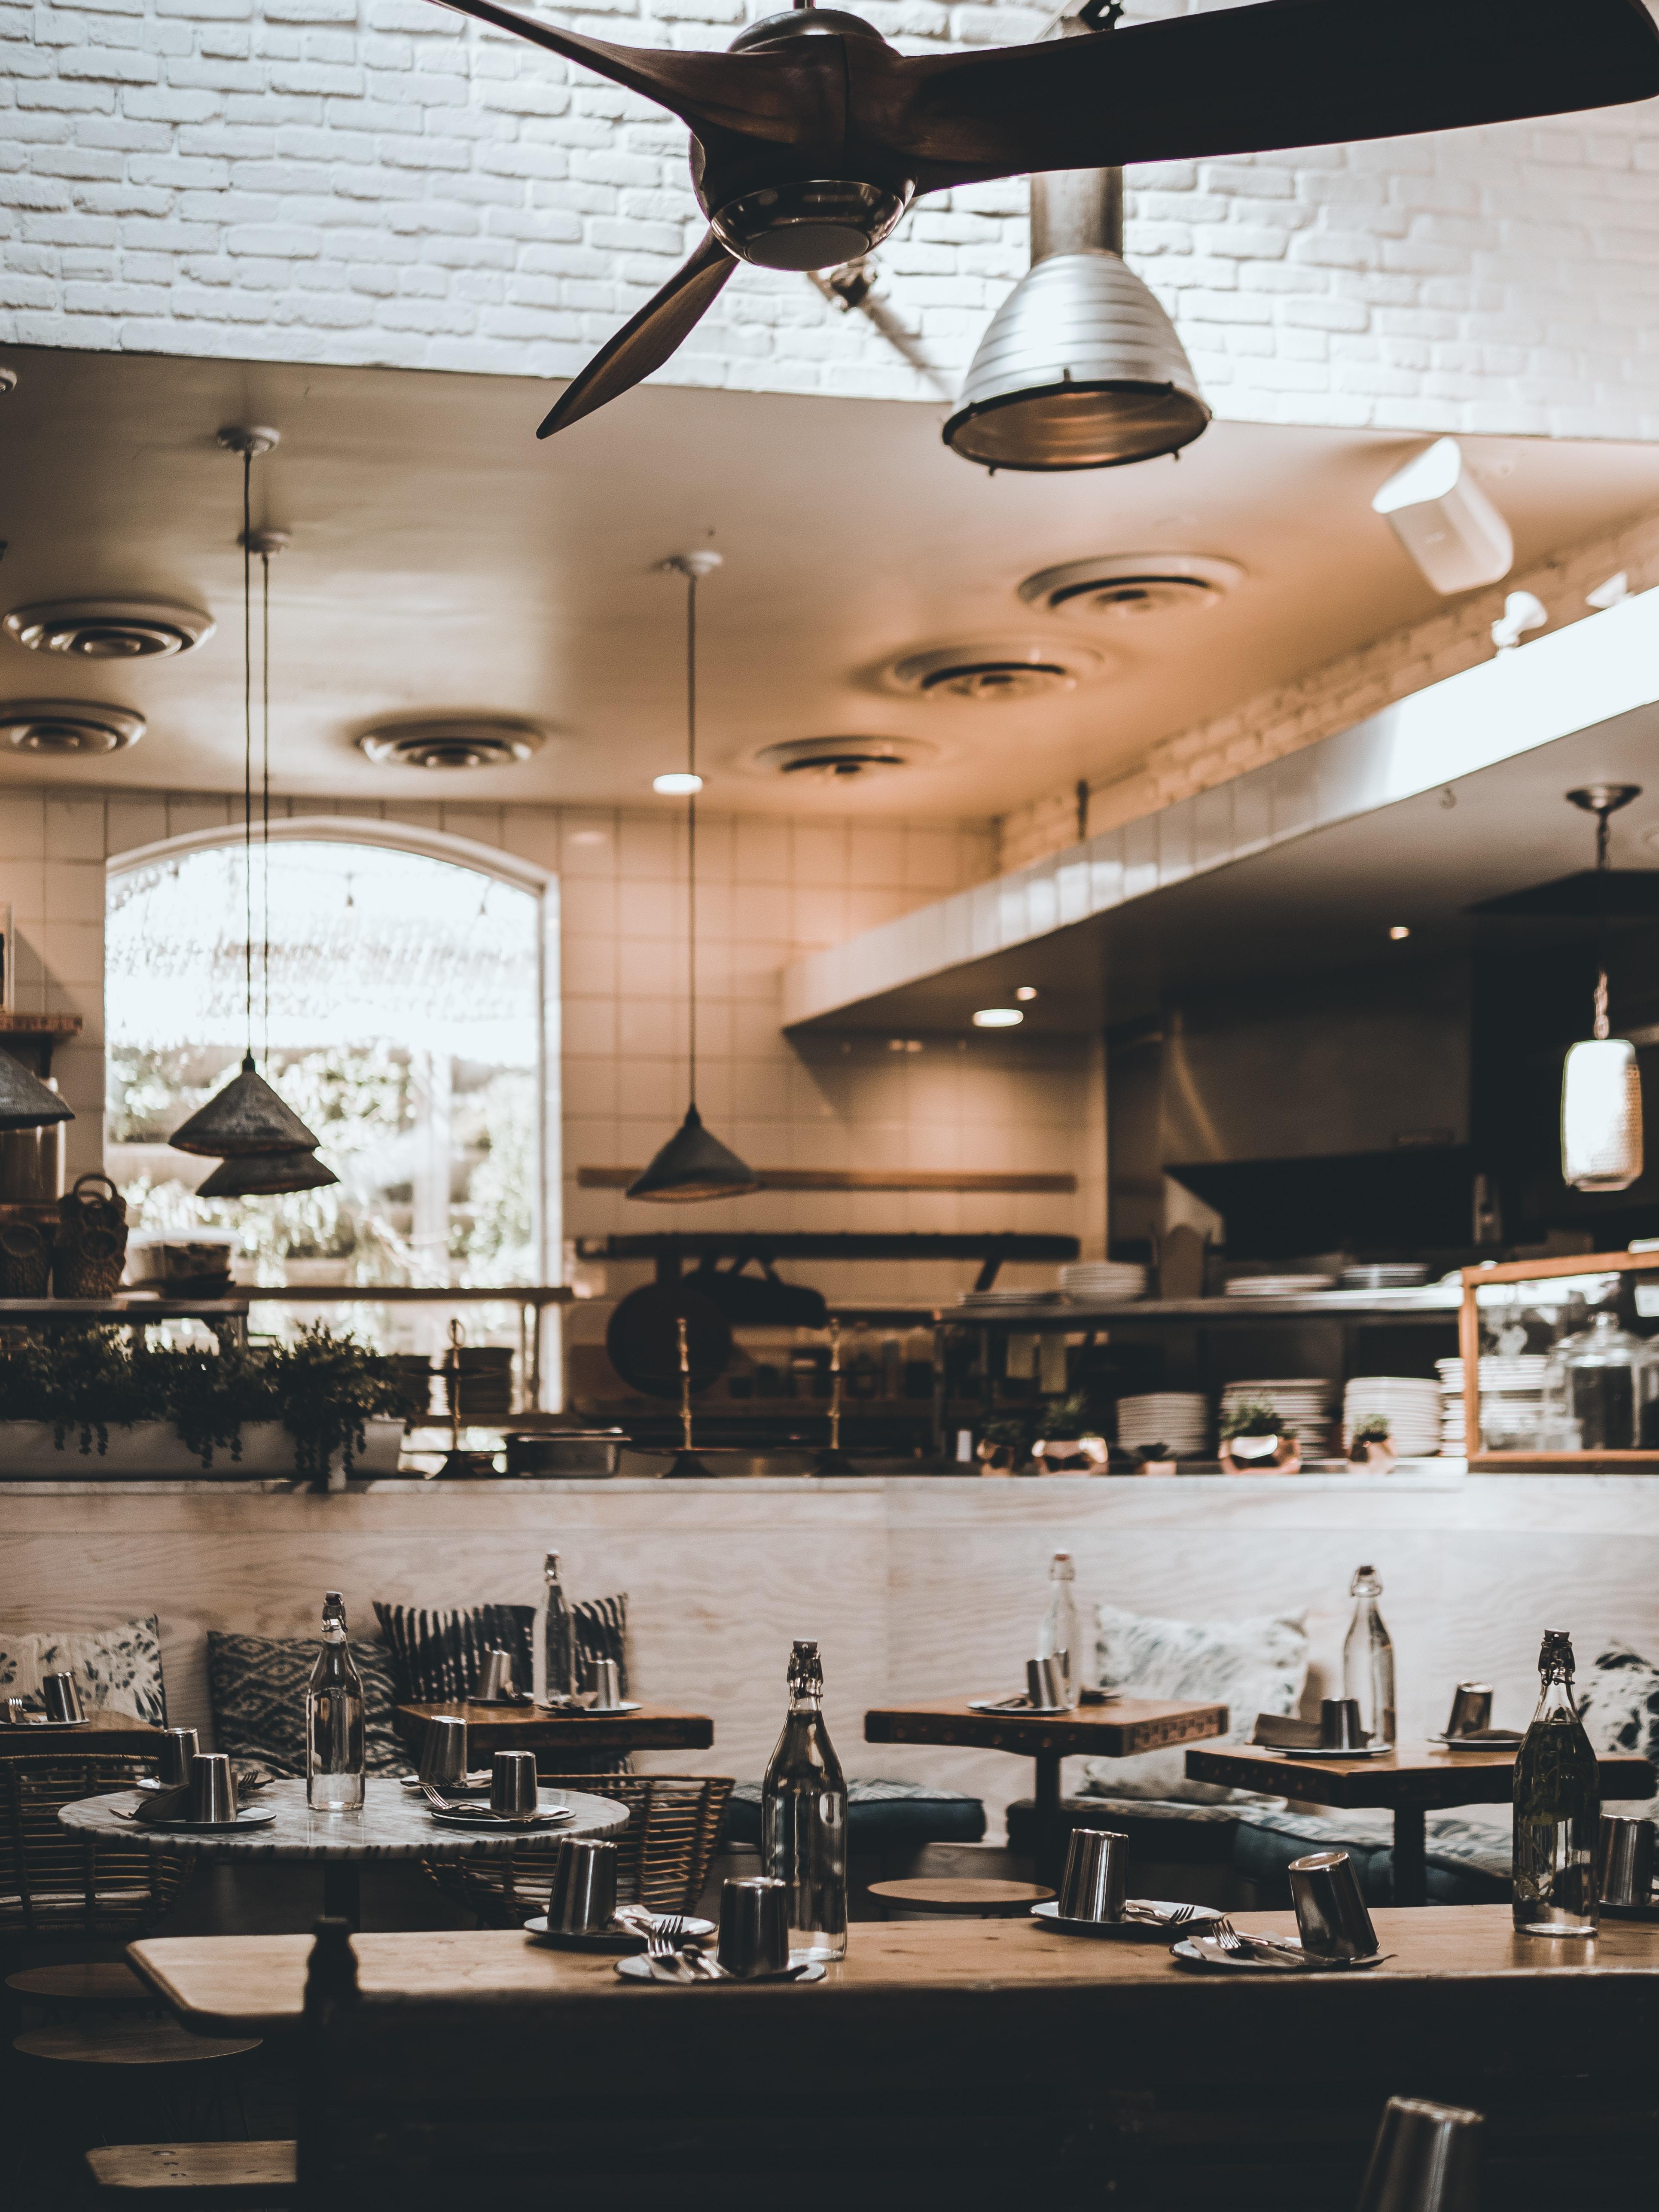 fine dining setup inside restaurant